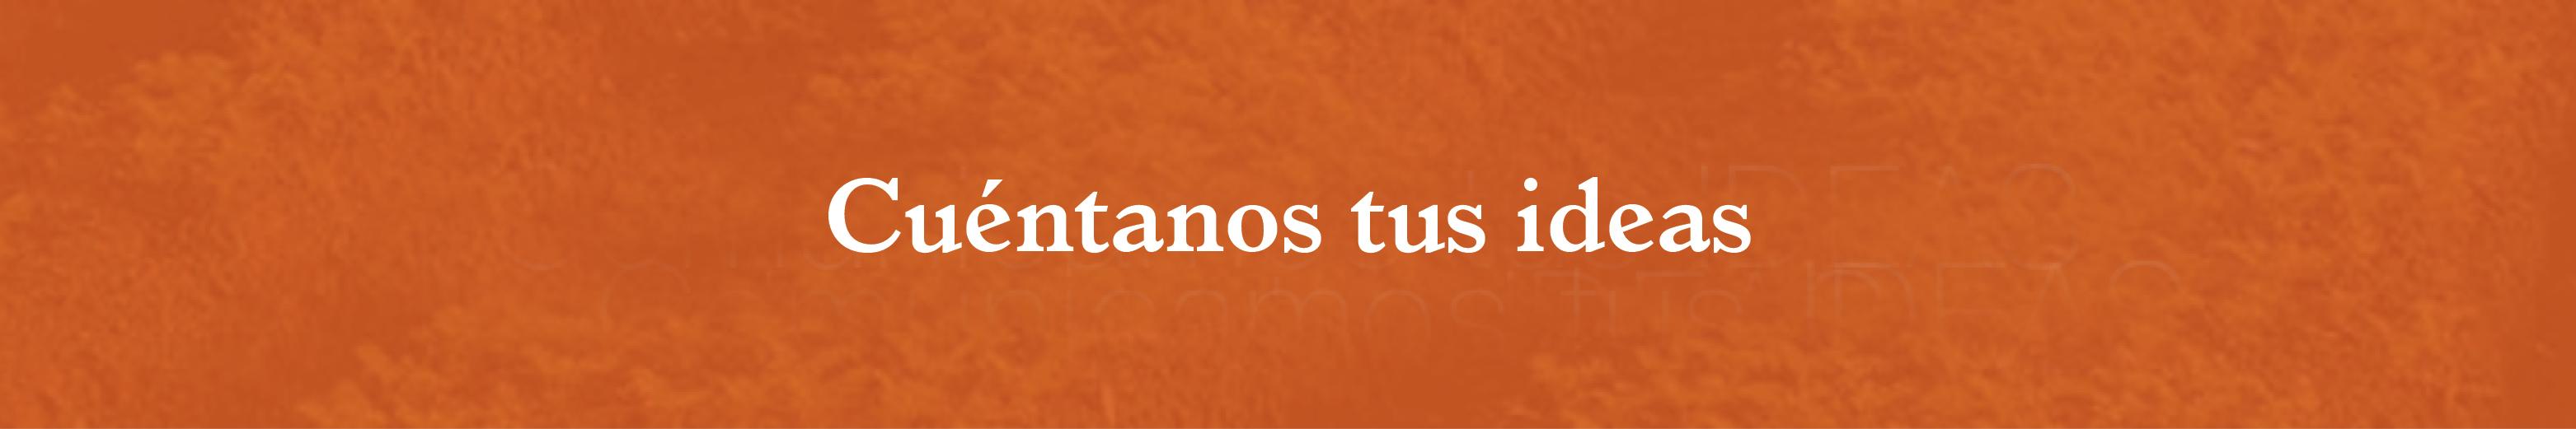 banner-naranja6